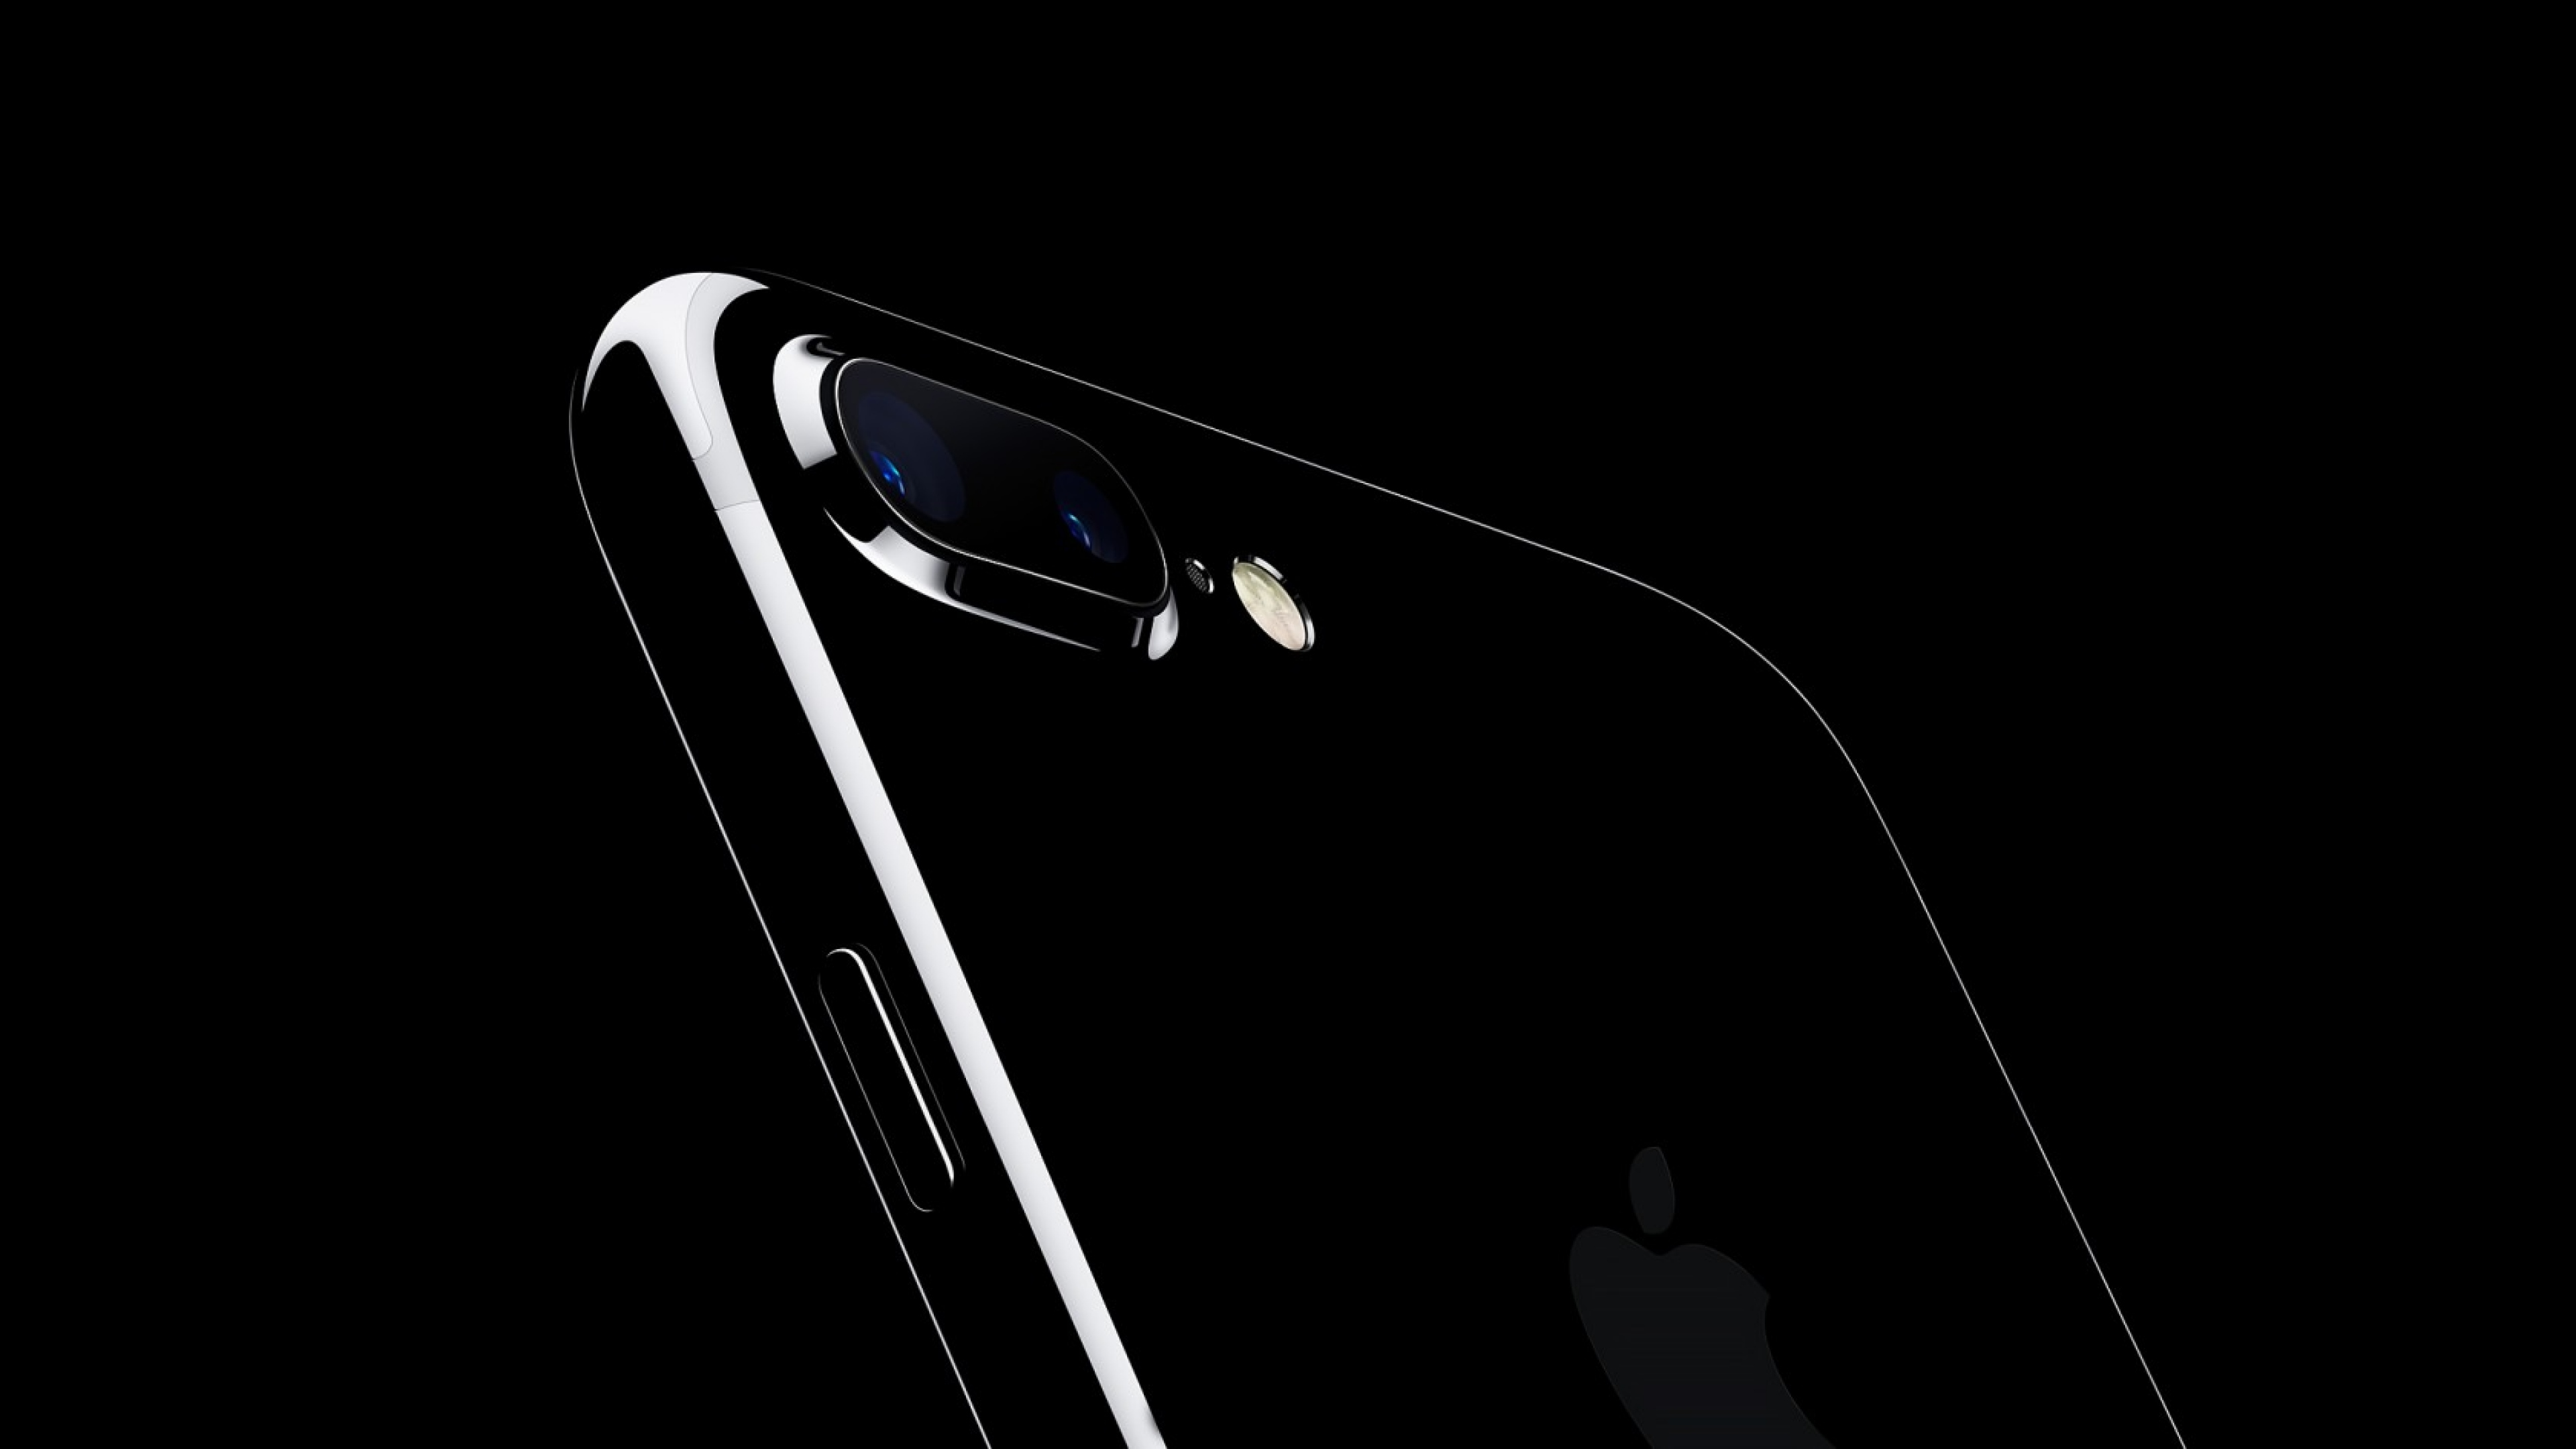 Apple Iphone 7 Wallpaper 4k Wallpaper Directory